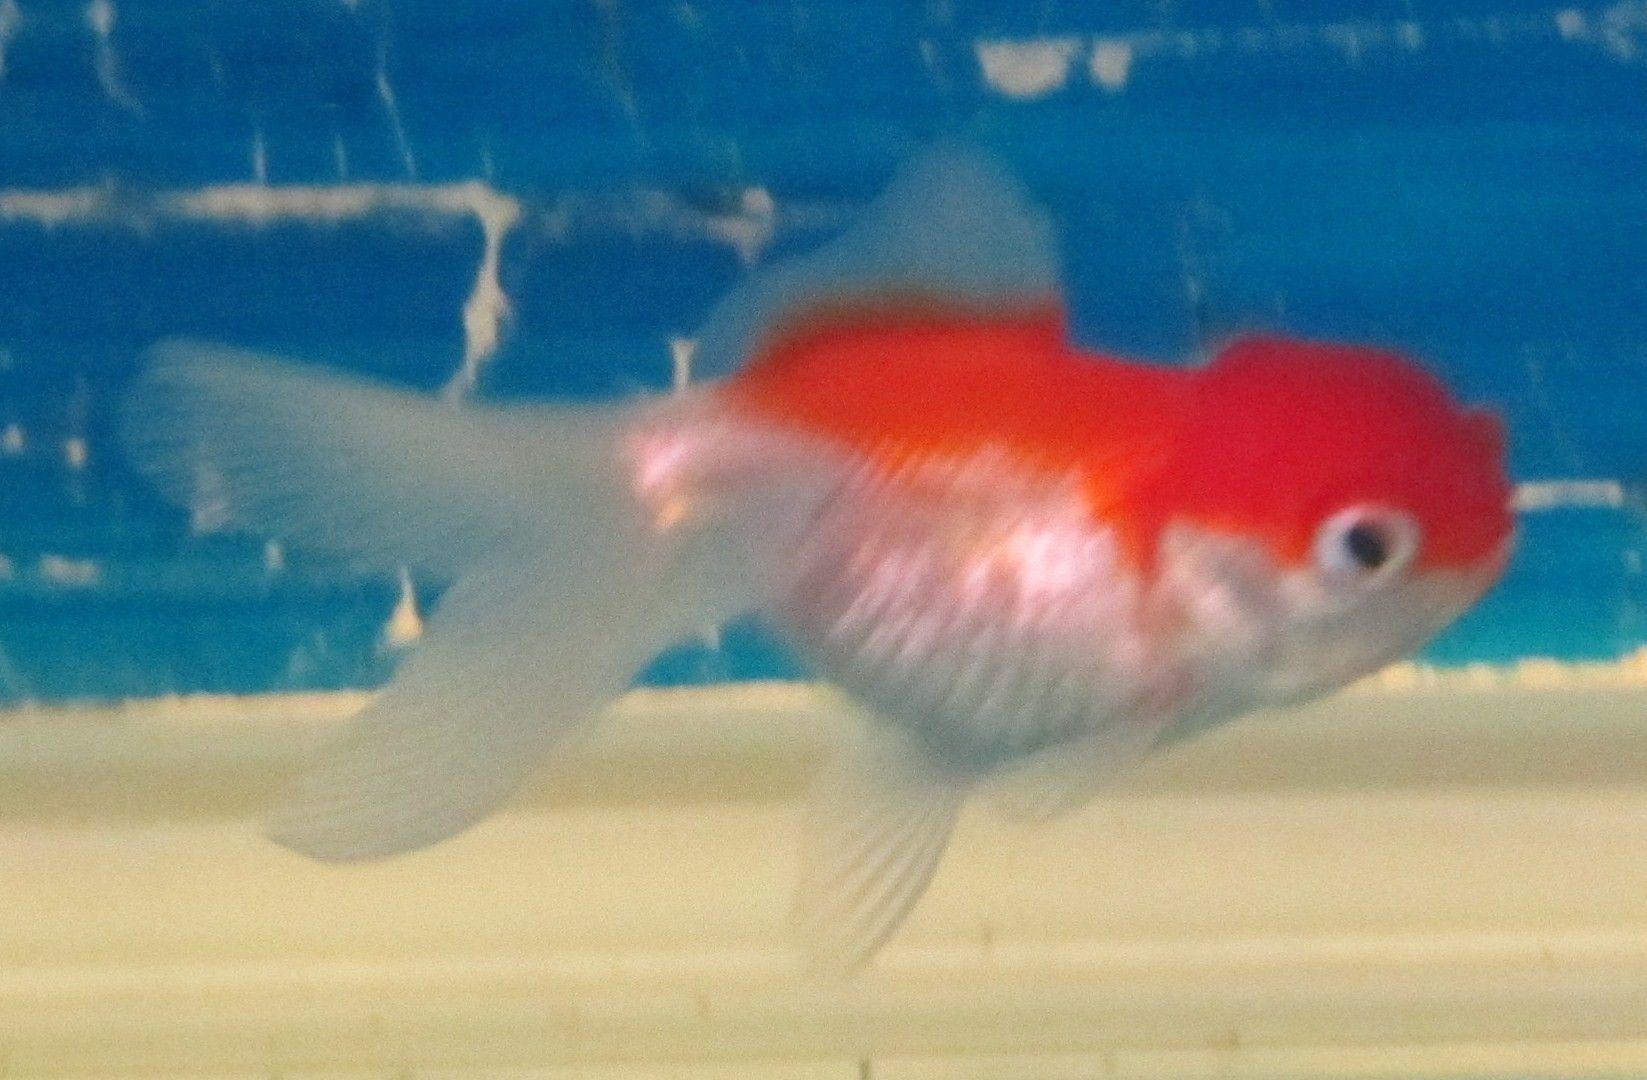 Rød / Hvid + rød Oranda Slørhale. str. 9 cm.( 2 stk. tilbage)